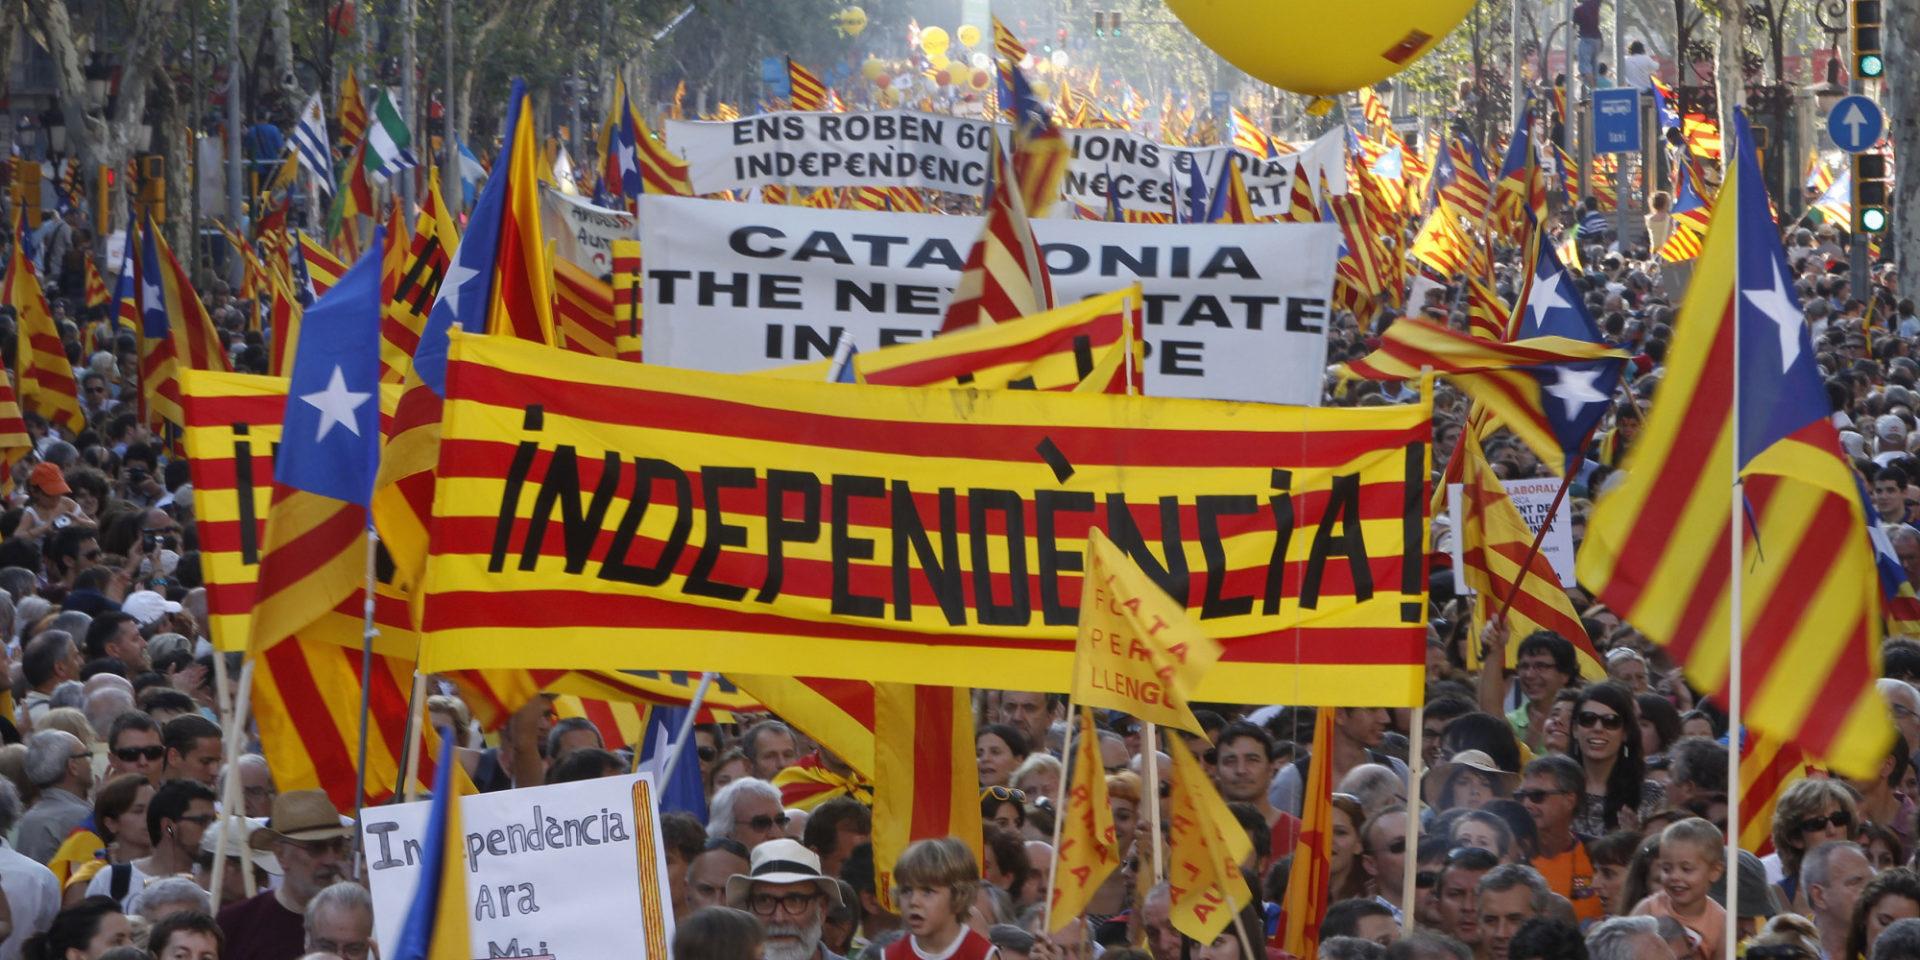 Manifestation indépendance Catalogne